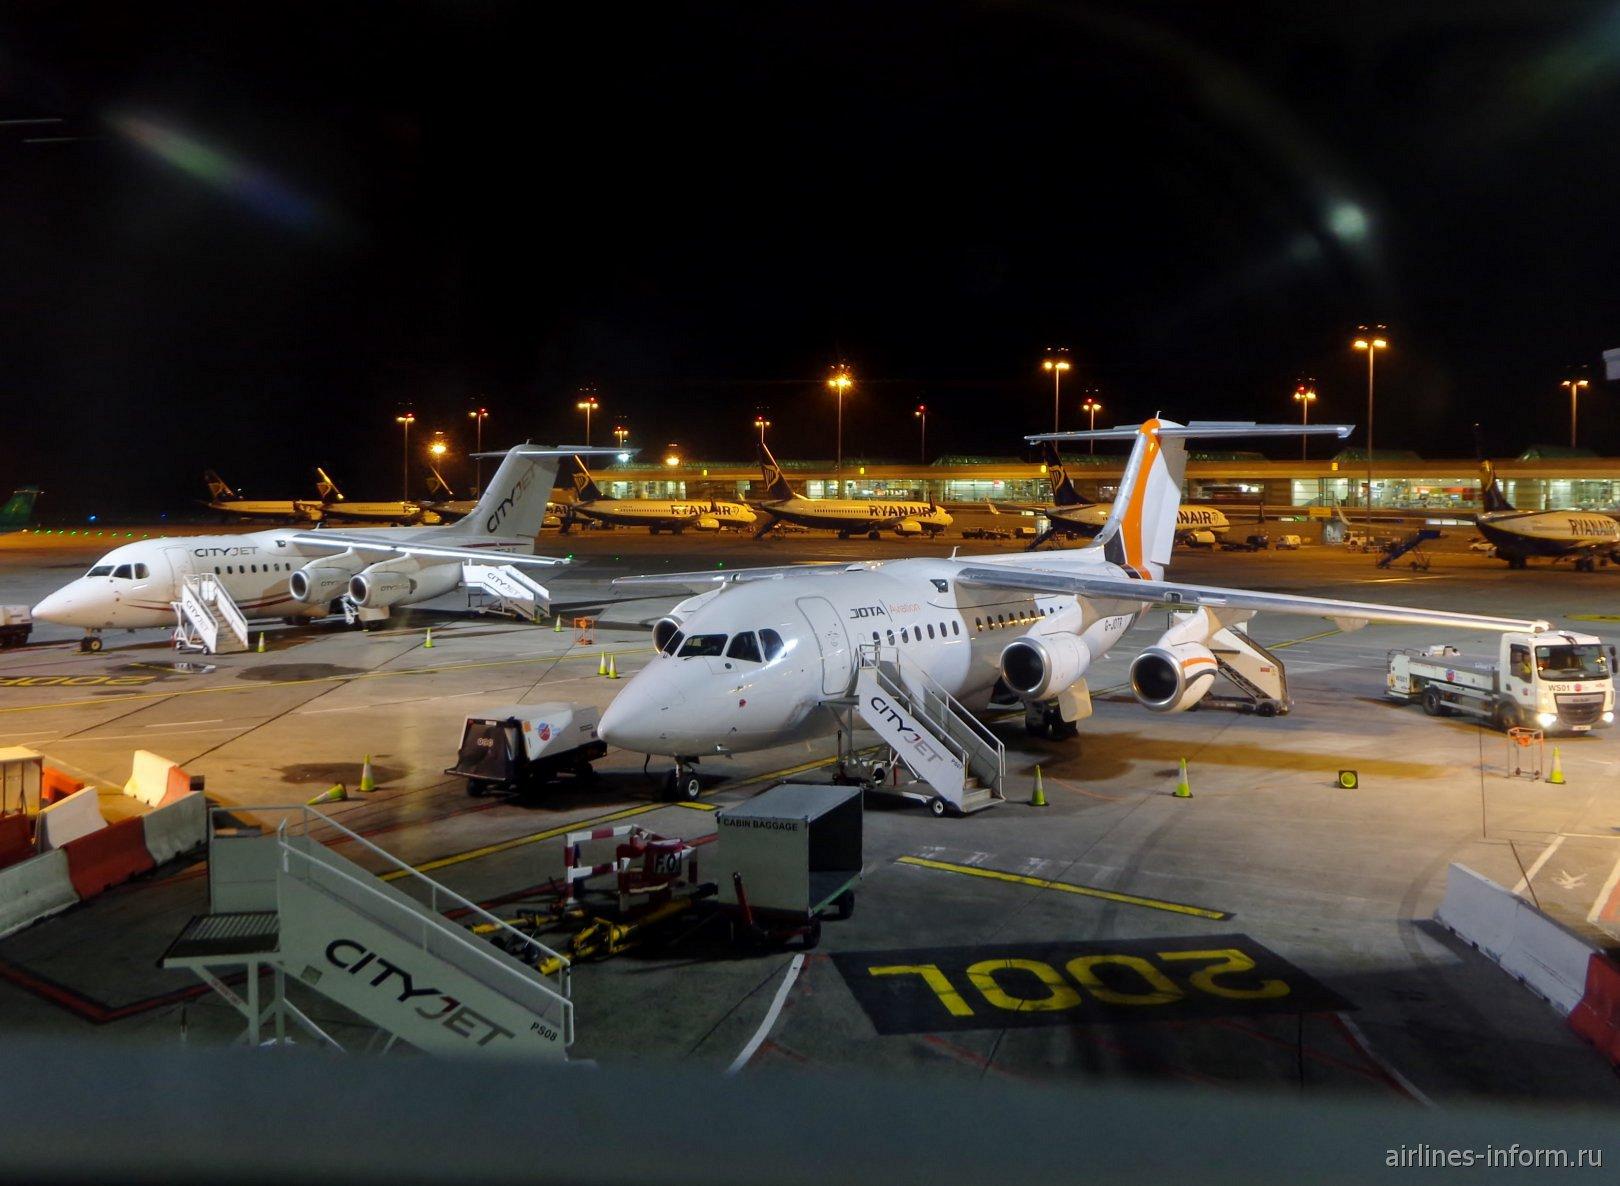 Самолеты на перроне у терминала 1 аэропорта Дублин